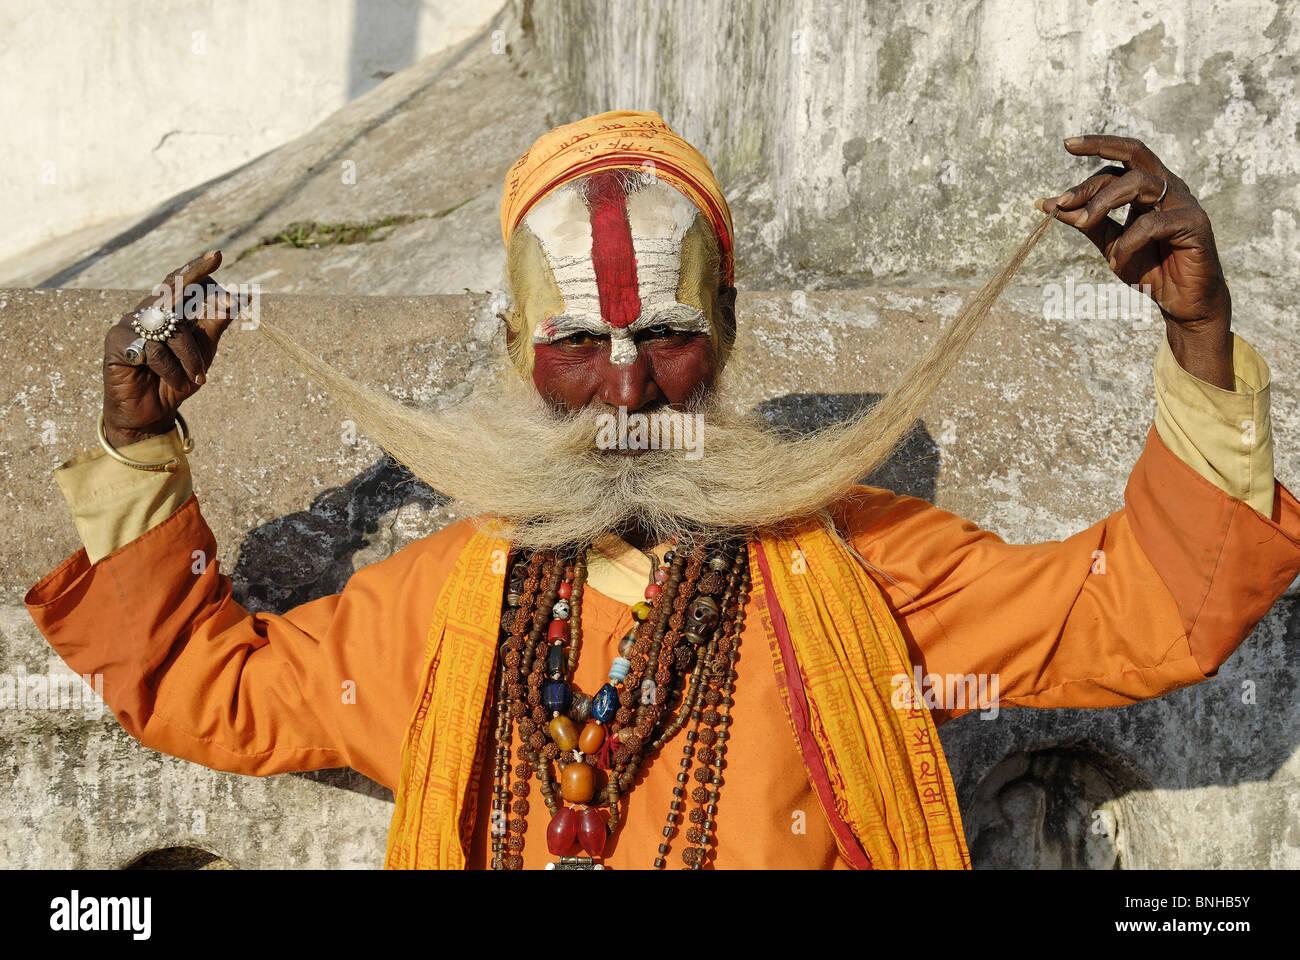 Sadhu holy man Pashupatinath Katmandu Nepal Himalayas Asia Asian asceticism ascetic ascetically beard whiskers painted - Stock Image